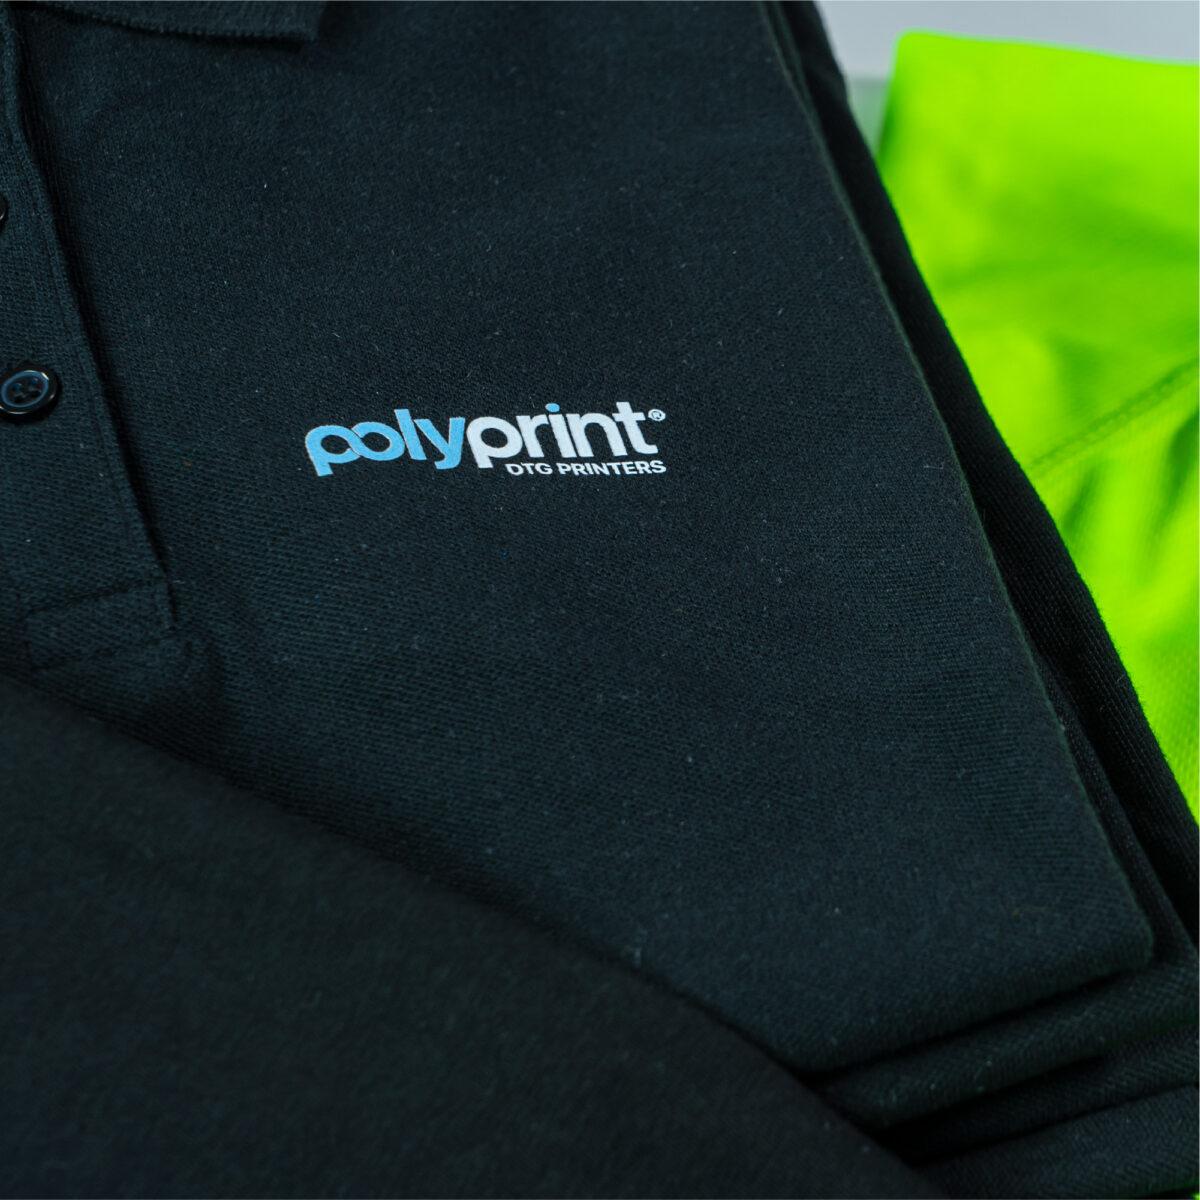 DTF Xpress Printed Logo on Polo Shirt Garment